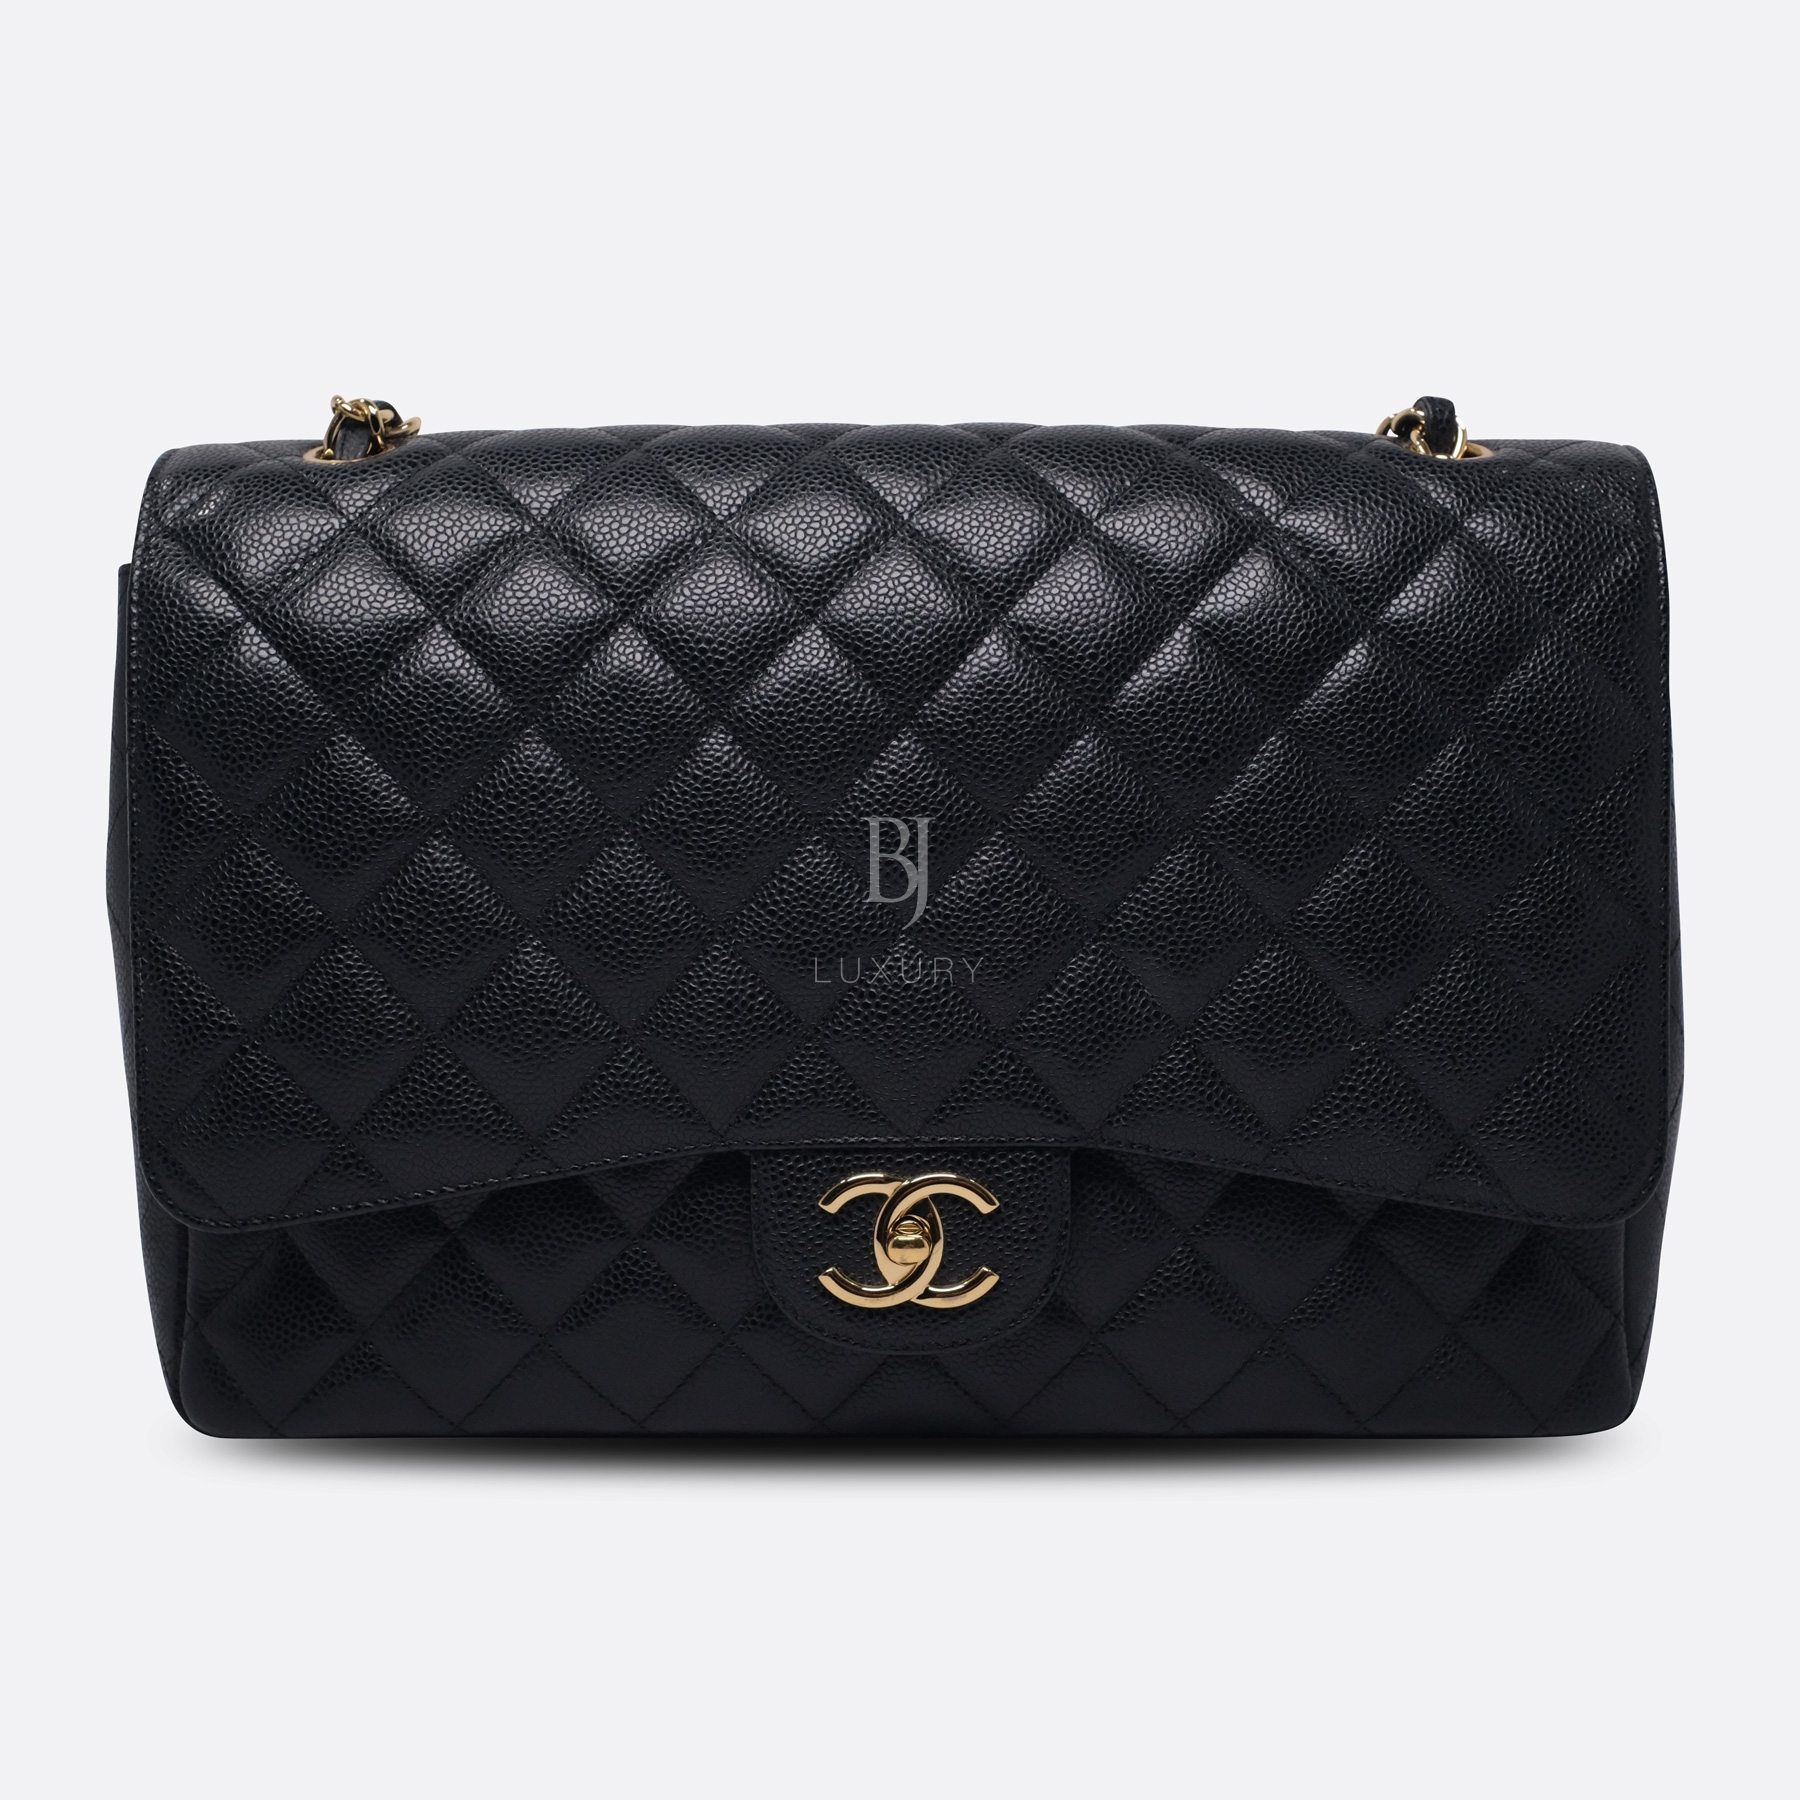 Chanel Classic Handbag Caviar Maxi Black BJ Luxury 1.jpg